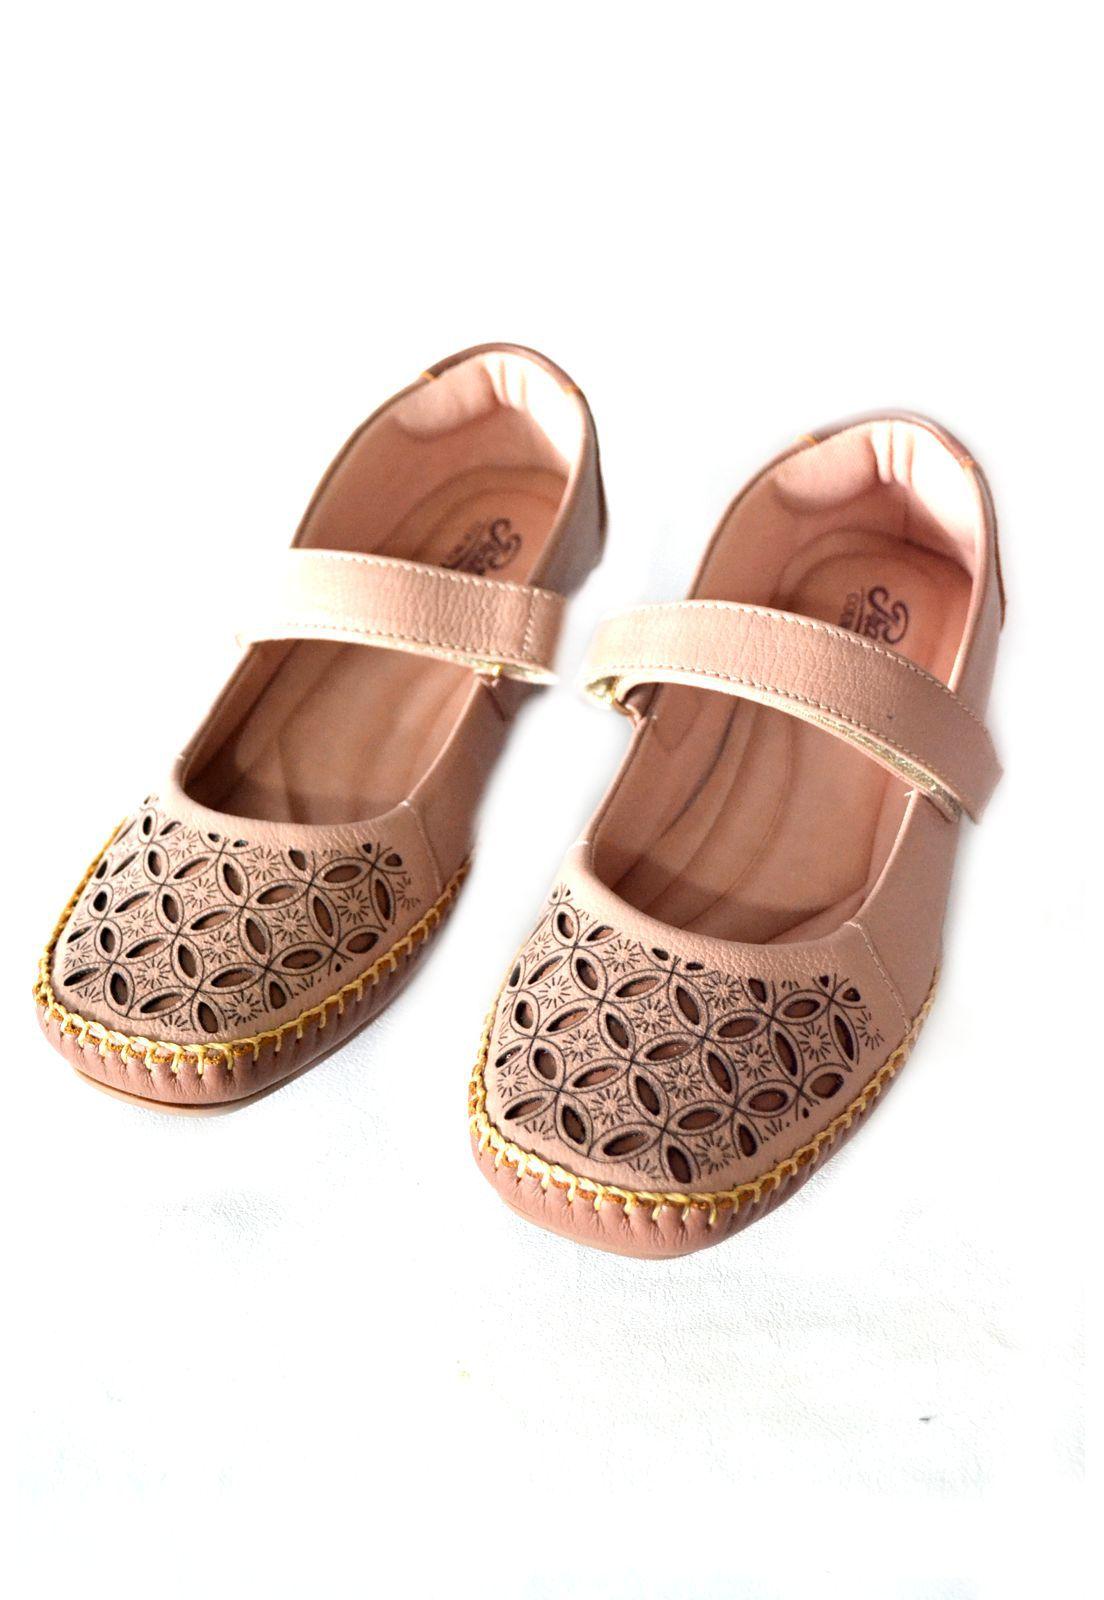 Sapato Prata Couro Conforto 1010452 Nude/Conhaque